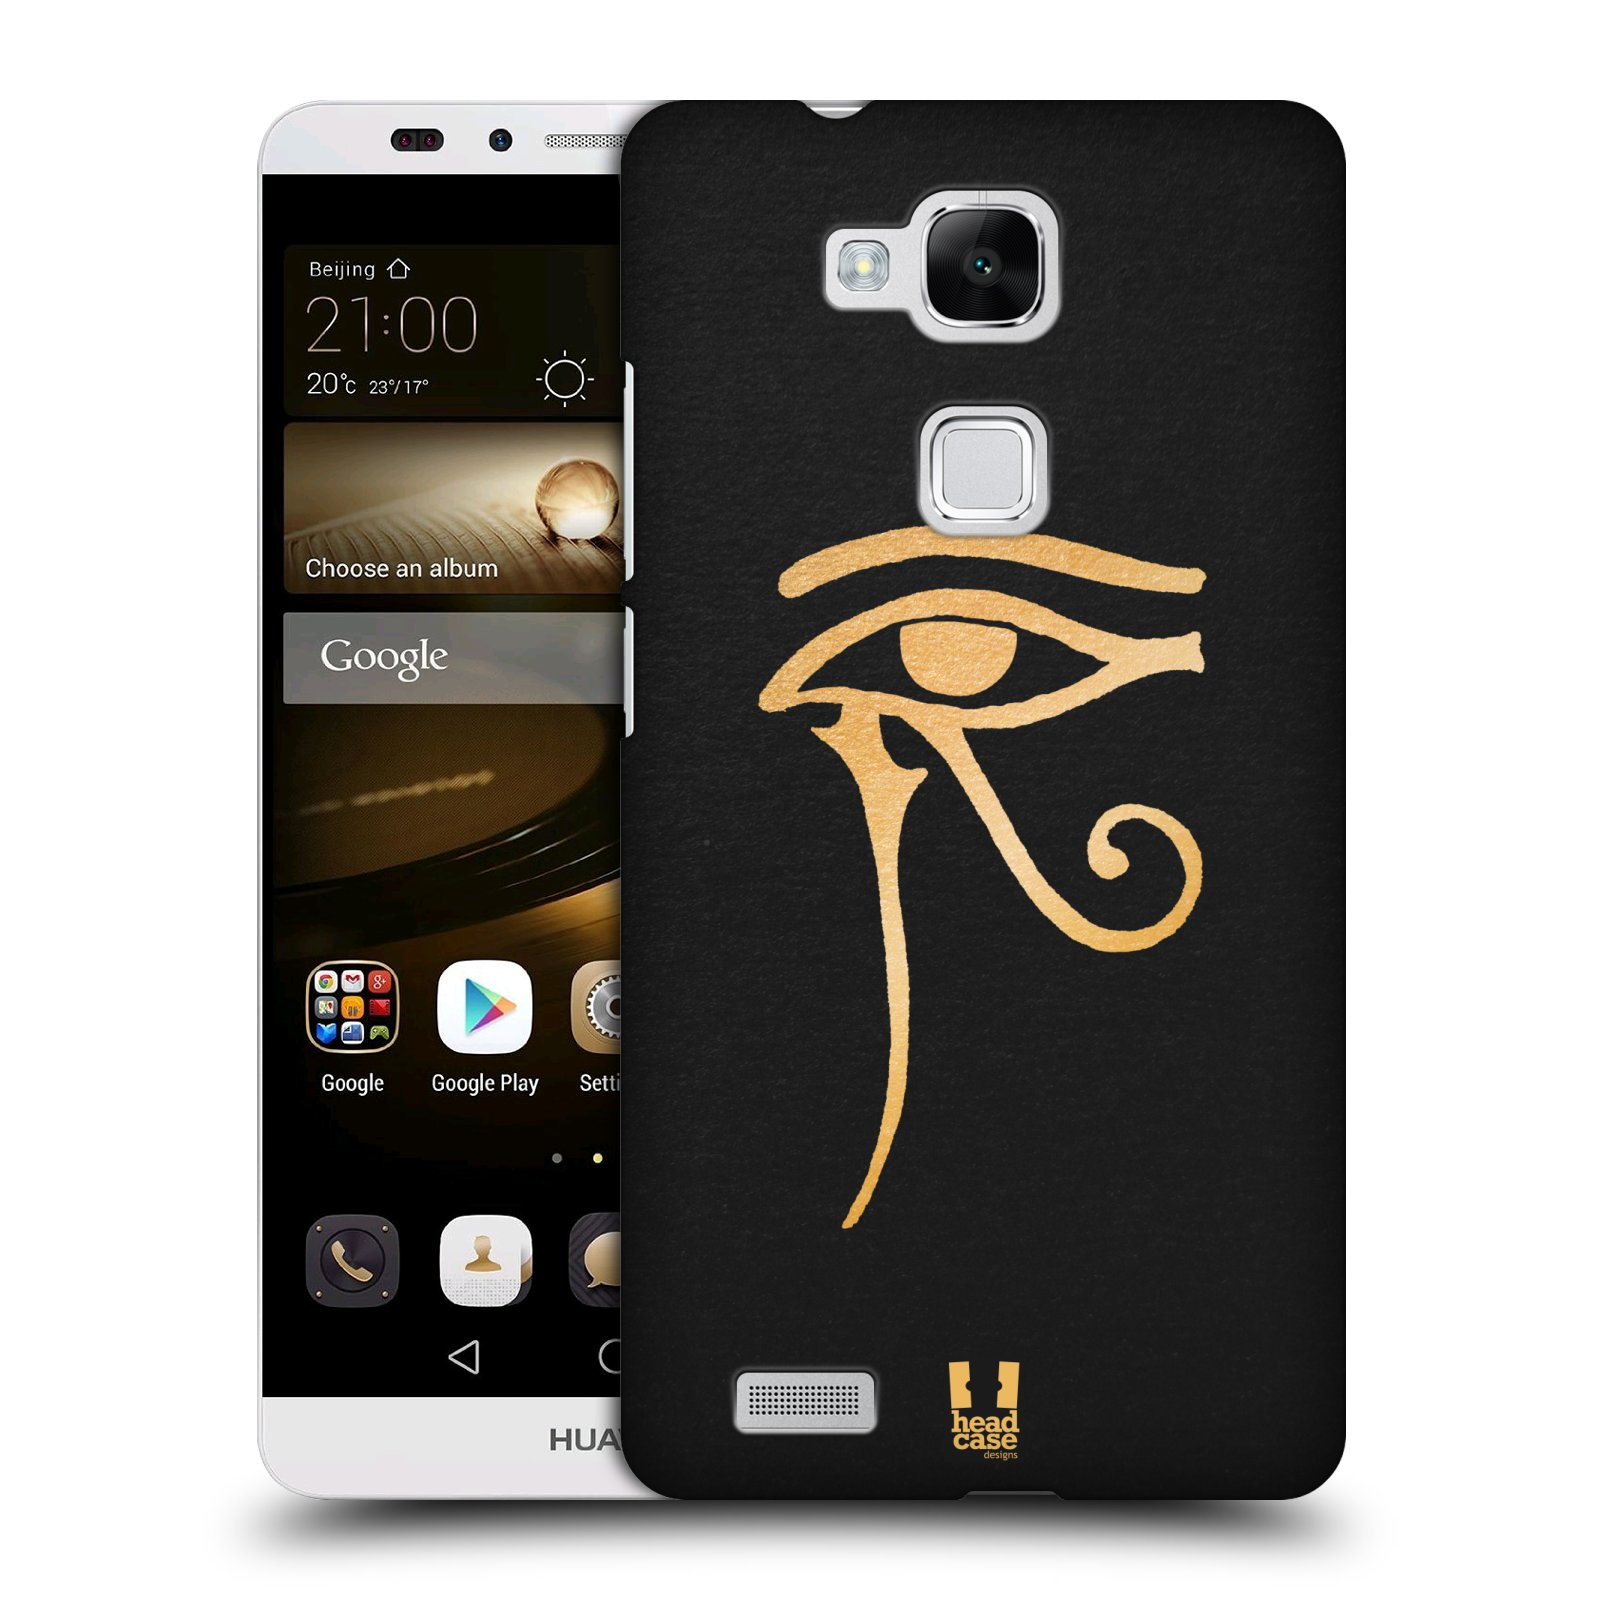 Plastové pouzdro na mobil Huawei Ascend Mate 7 HEAD CASE EGYPT OKO BOHA RA (Kryt či obal na mobilní telefon Huawei Ascend Mate7)